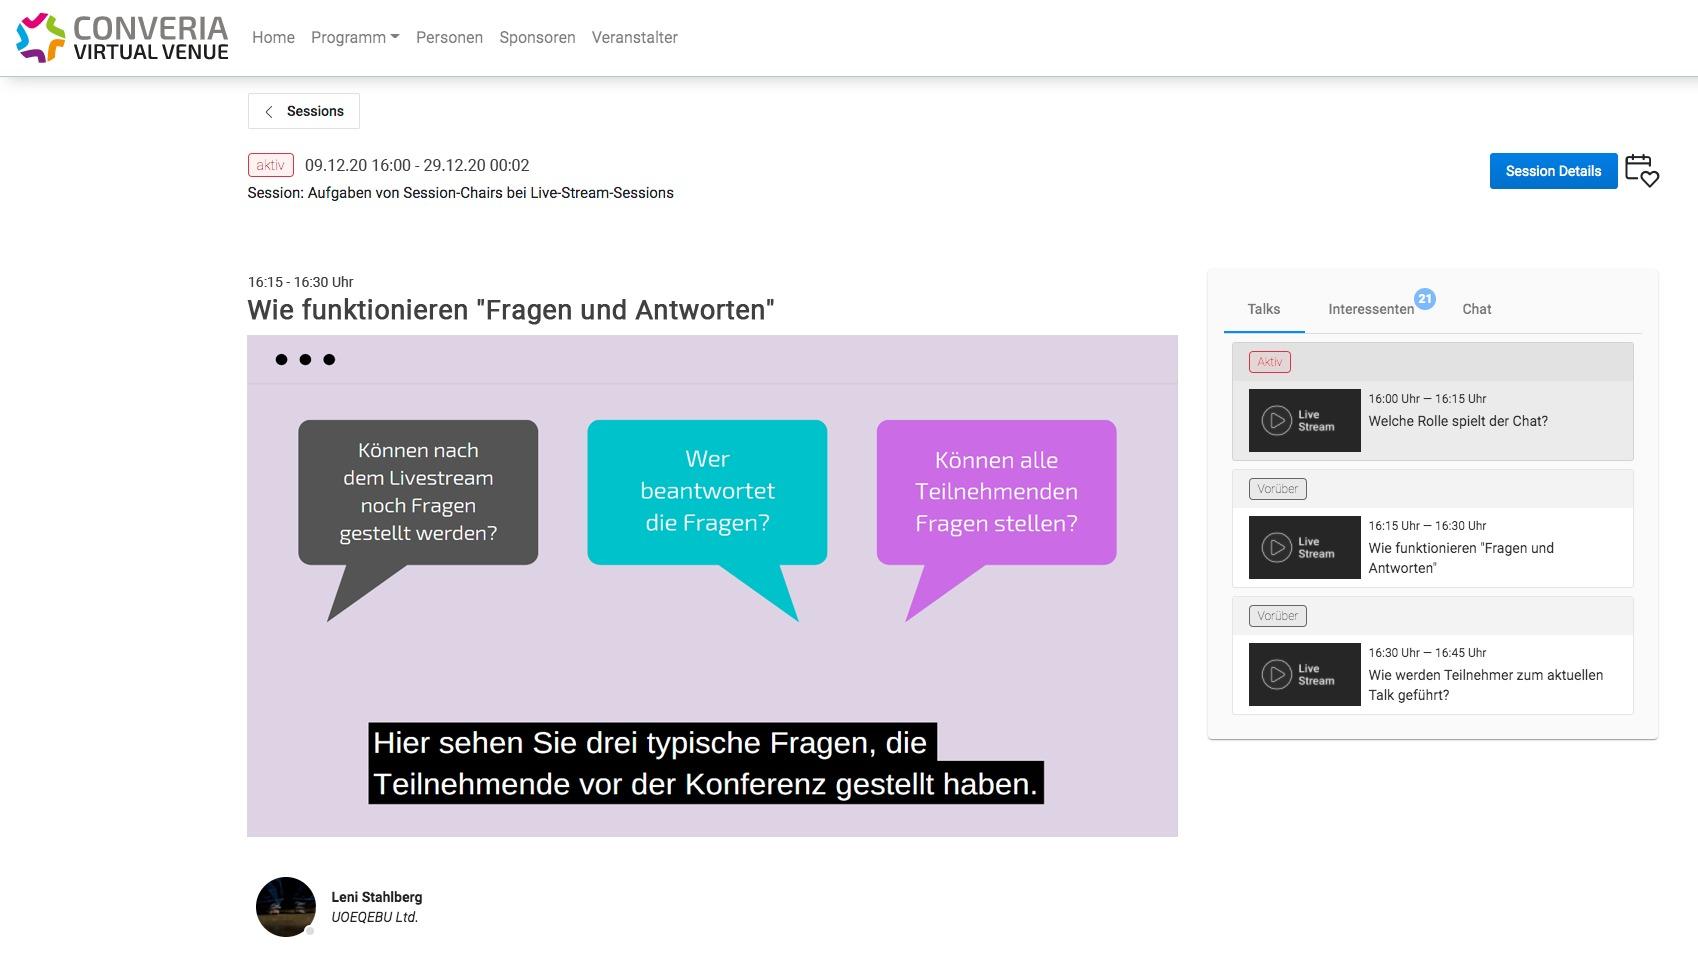 Vortrag mit Untertitel auf der Converia Virtual Venue